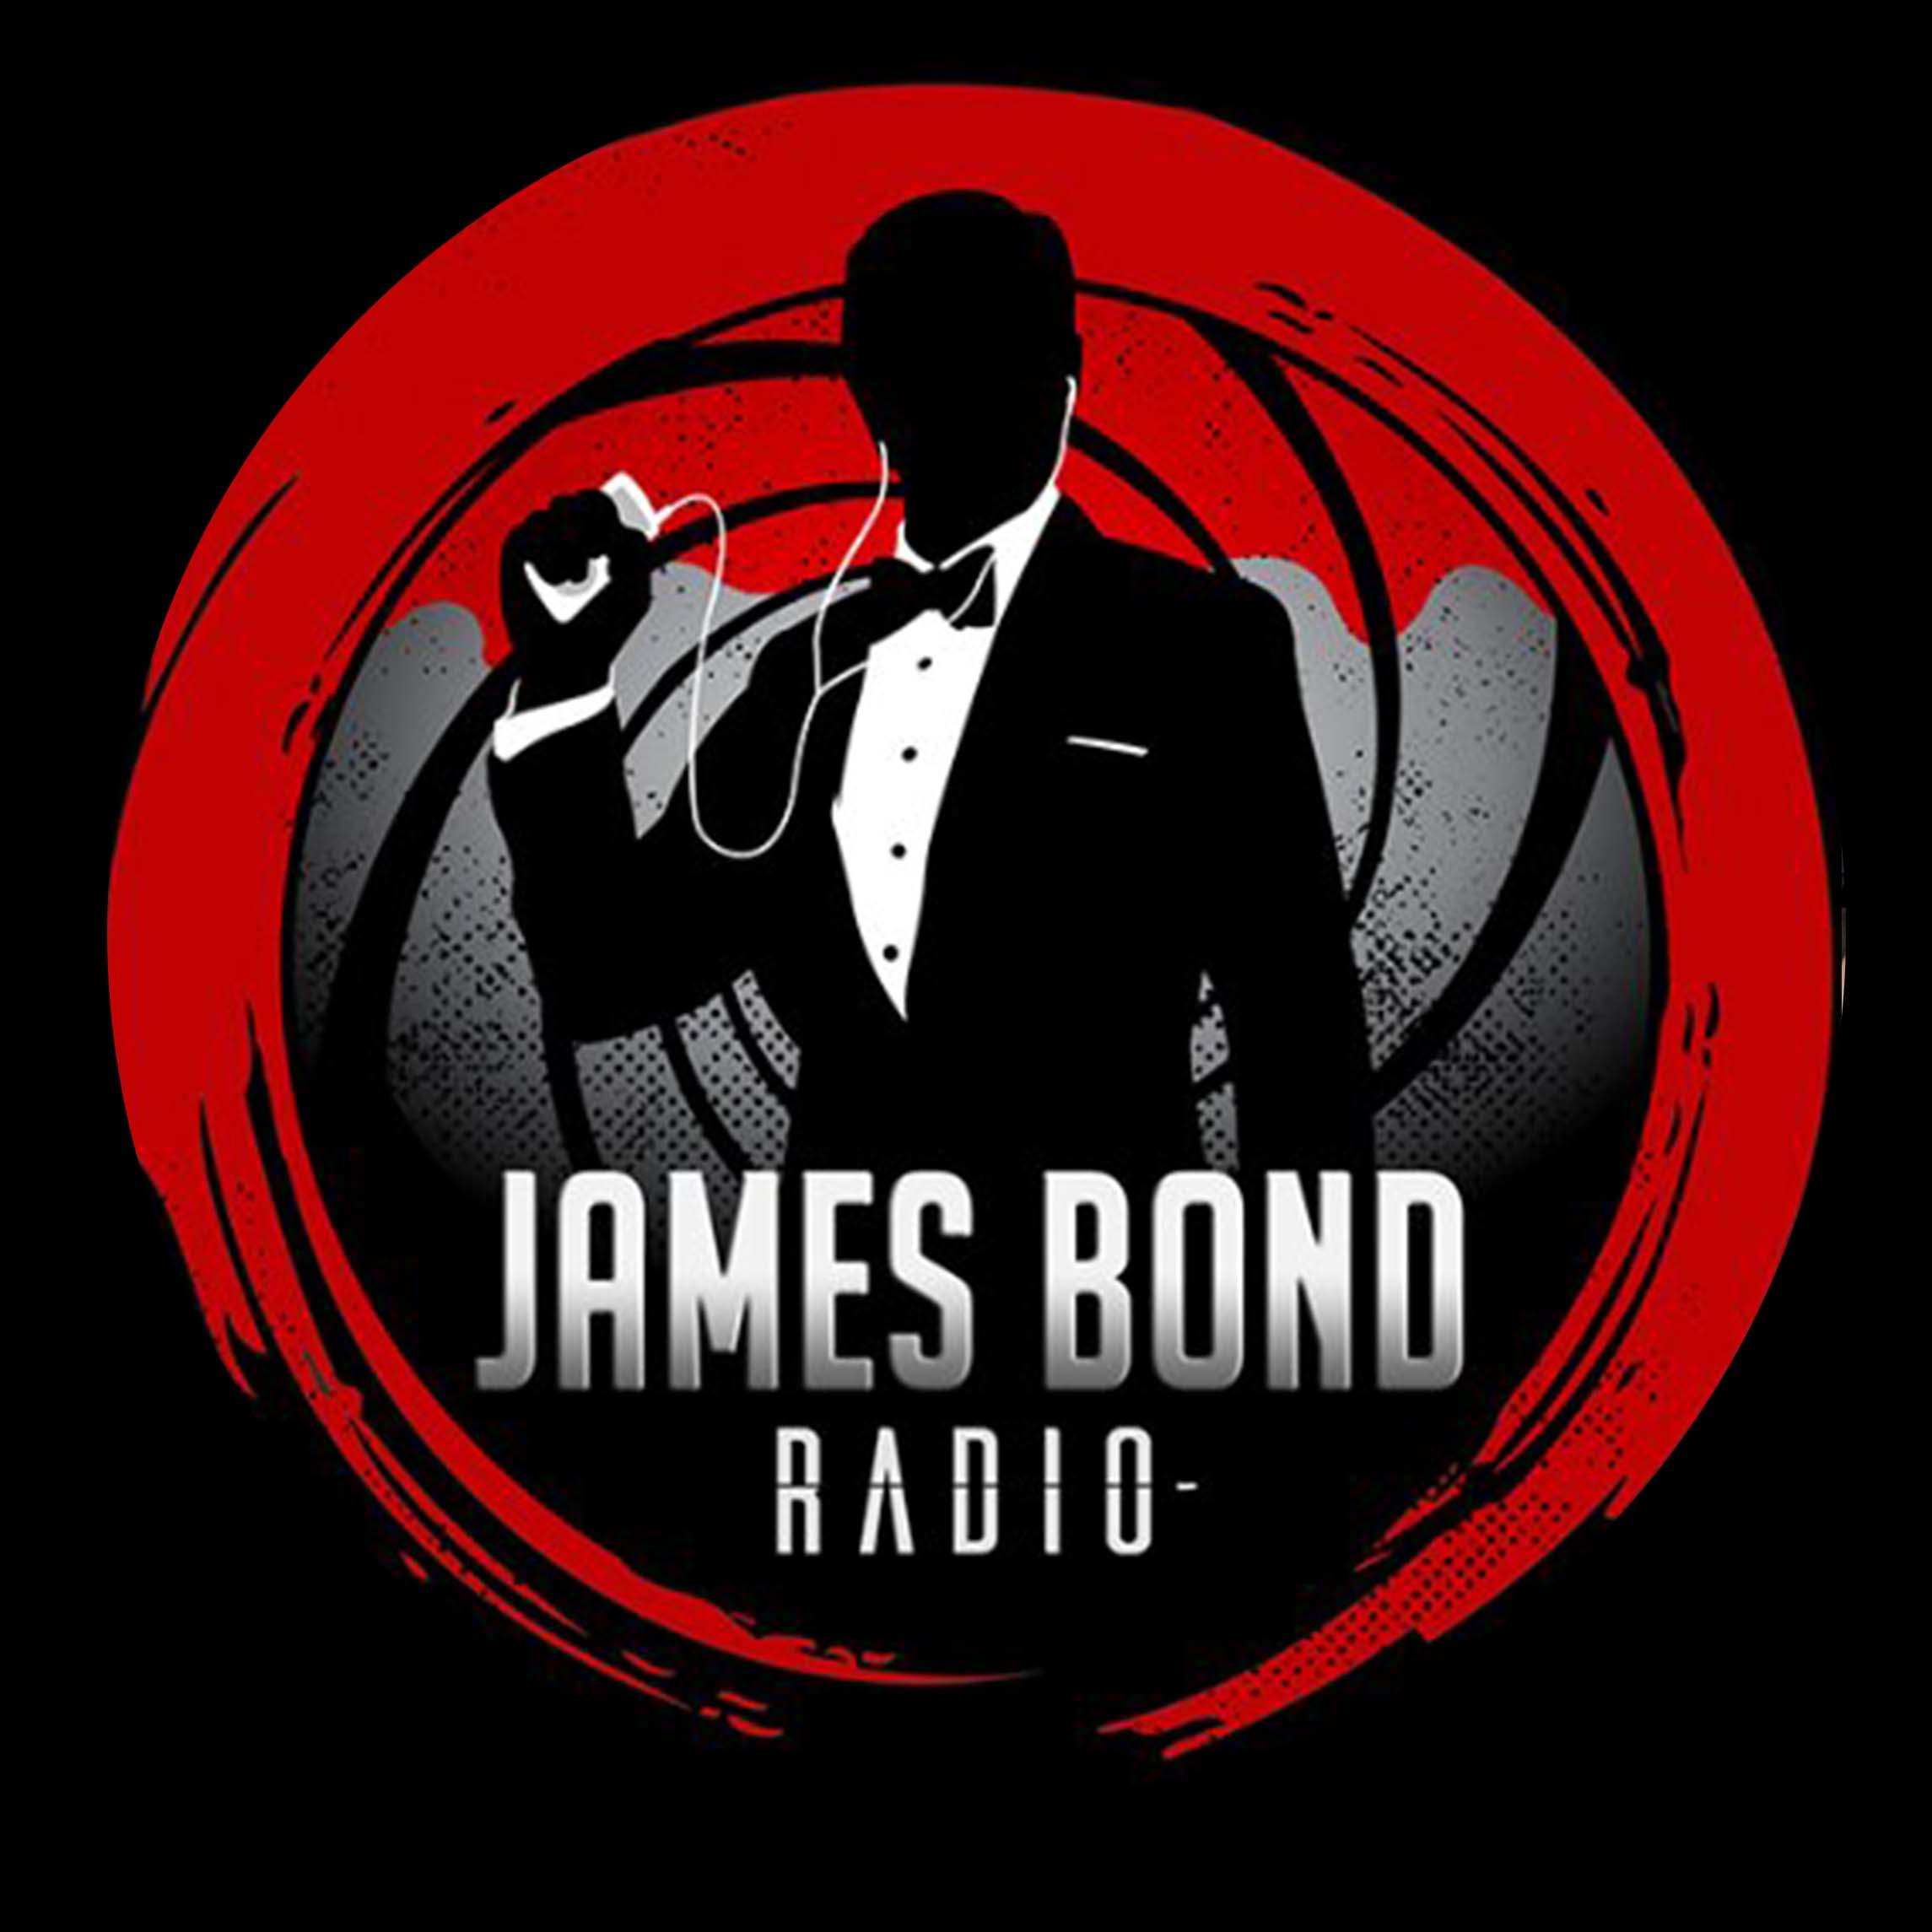 James Bond Radio.jpg